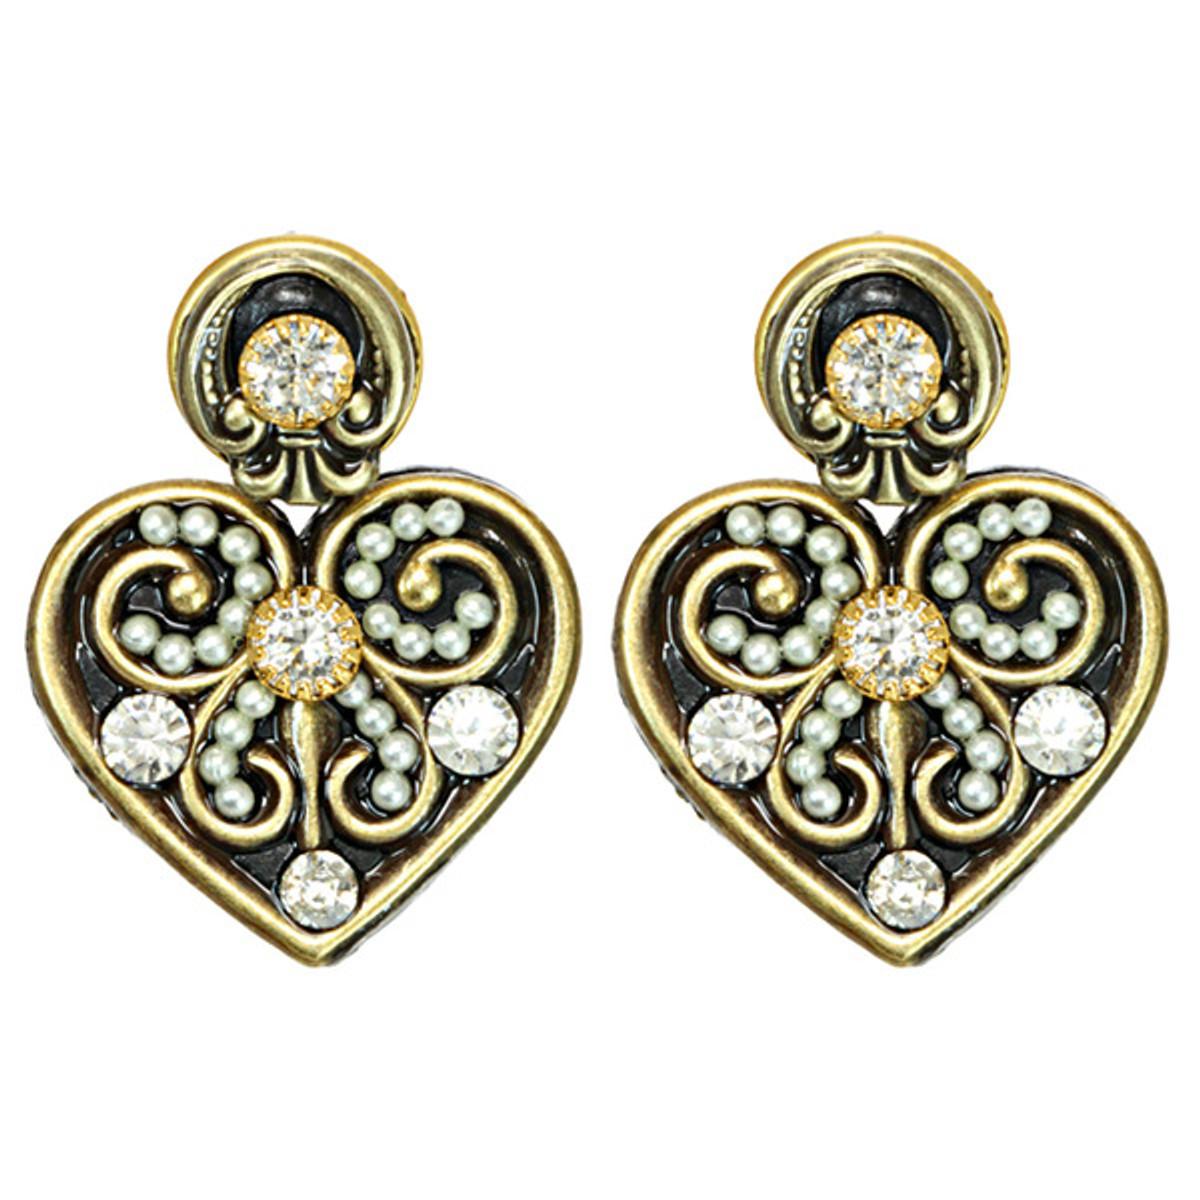 Lovely Deco Earrings By Michal Golan Jewelry